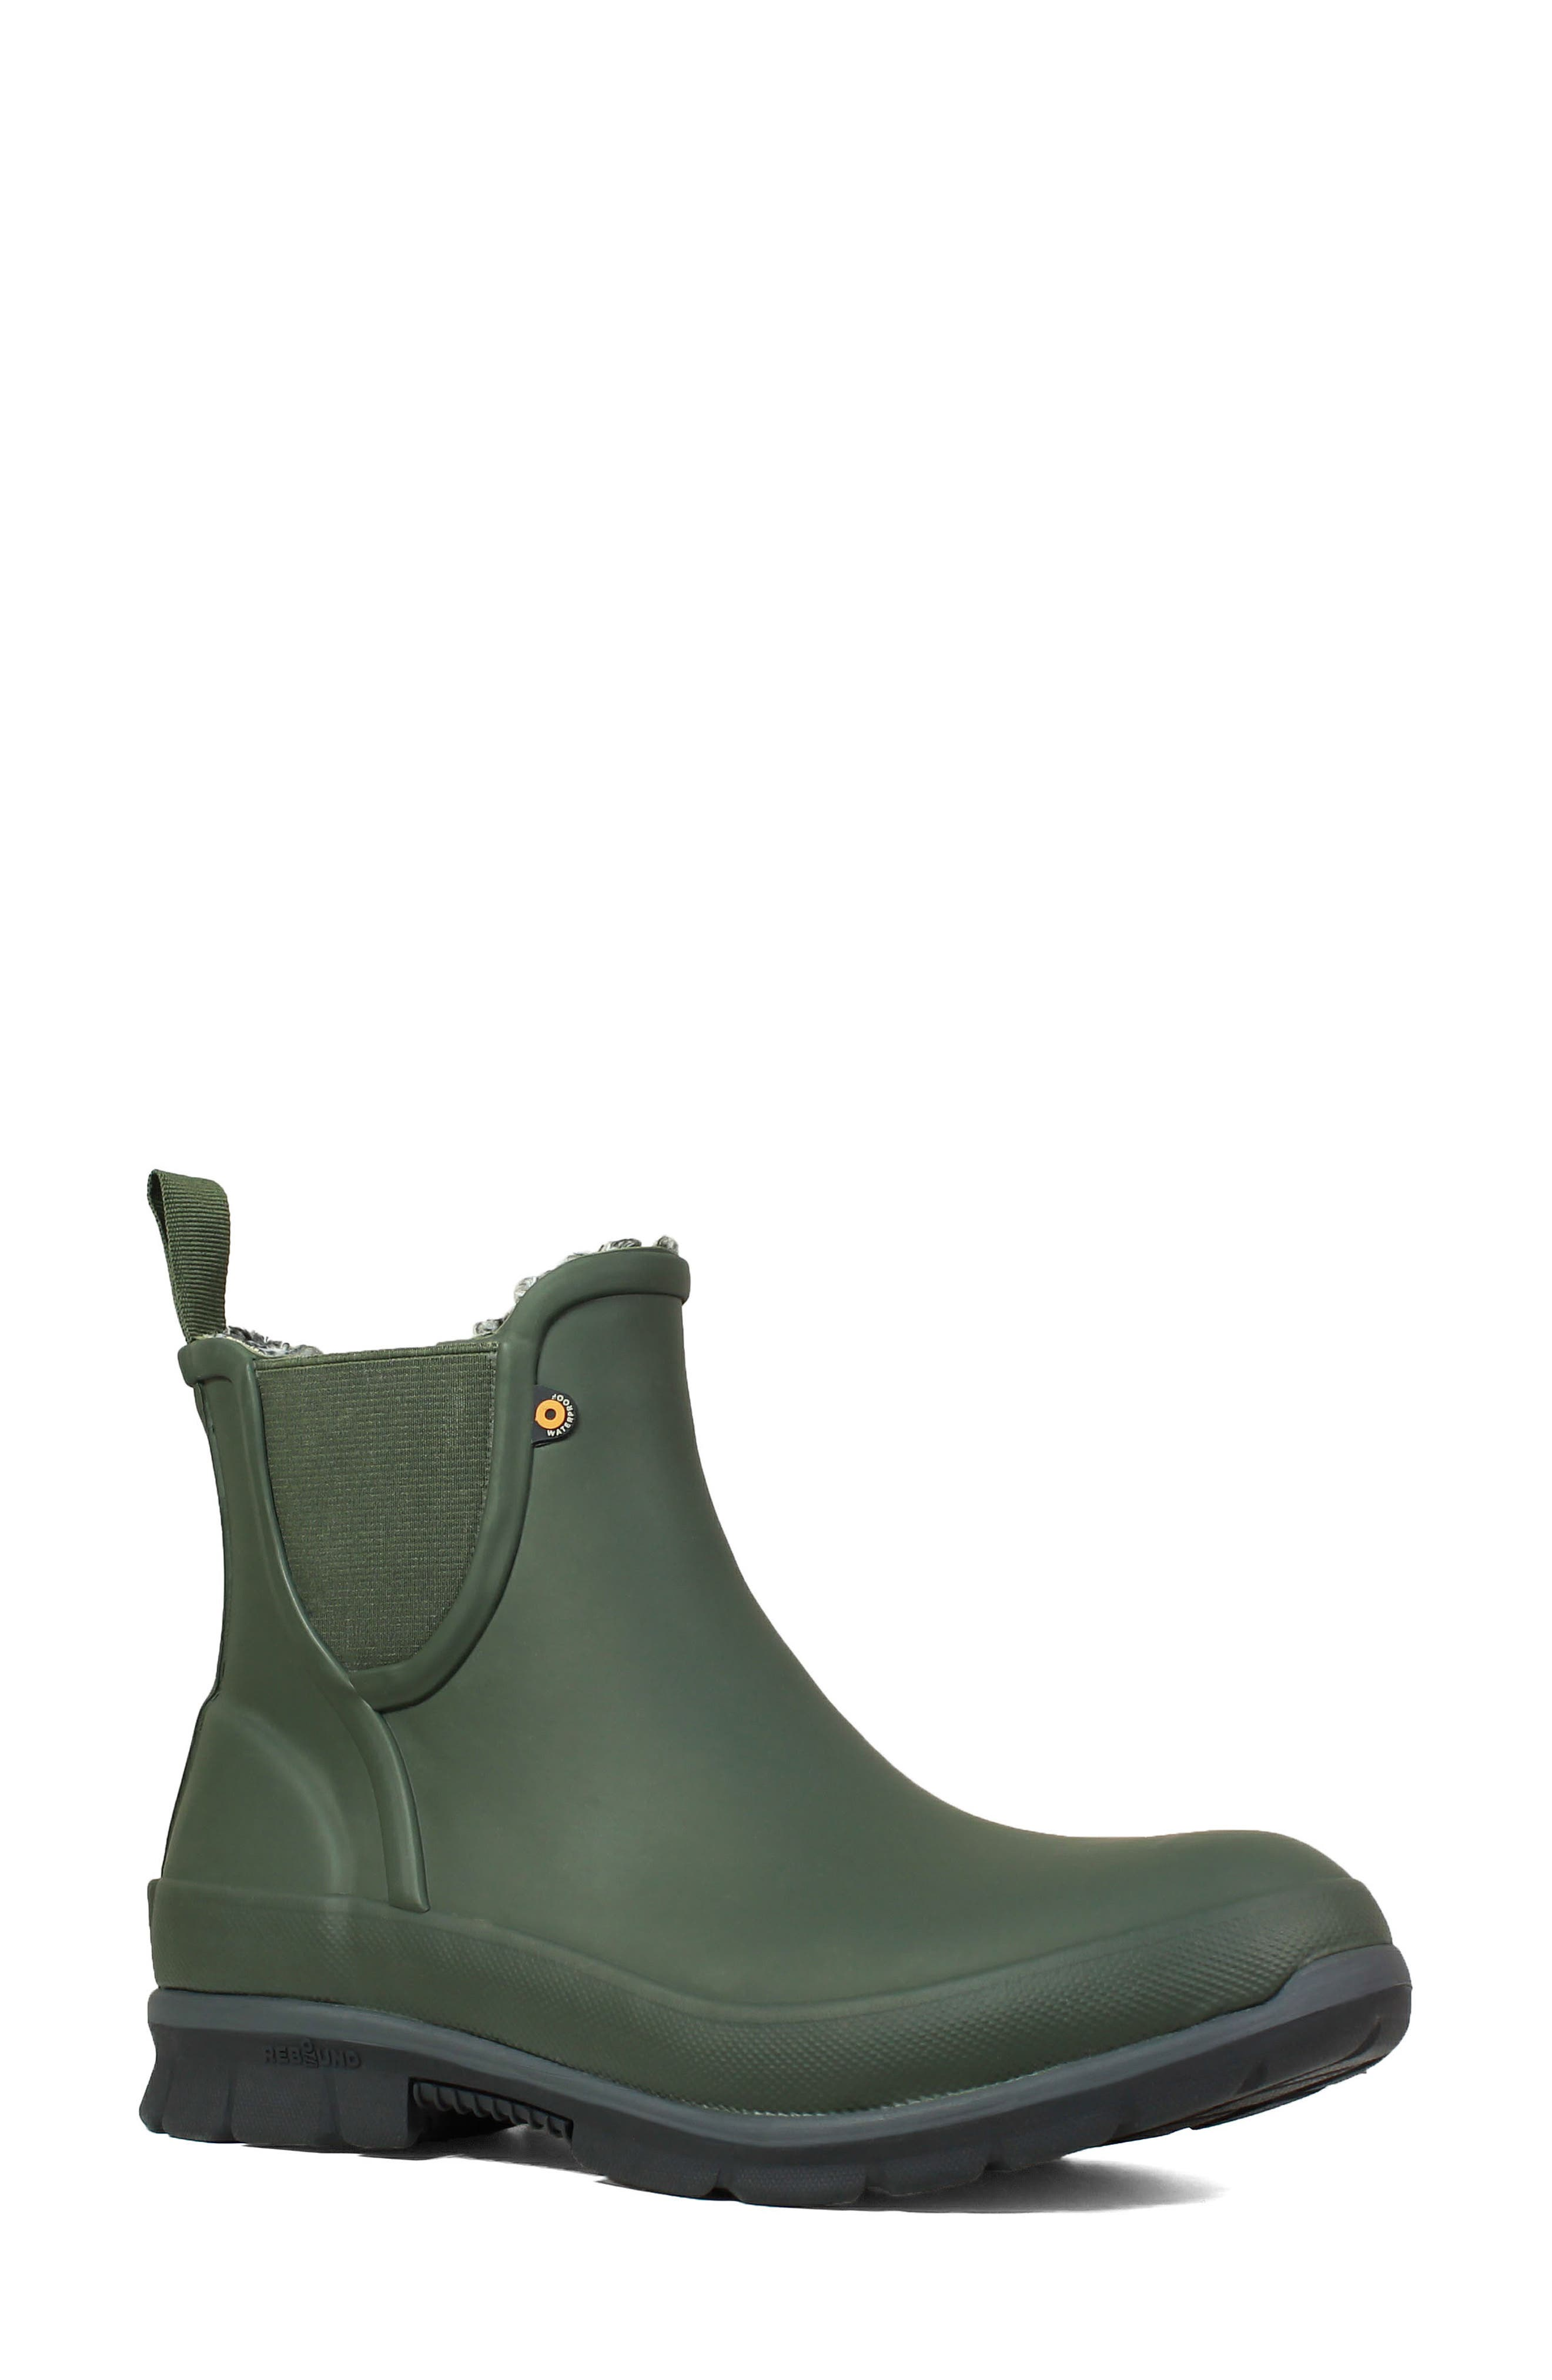 Bogs Amanda Plush Waterproof Slip-On Boot, Green